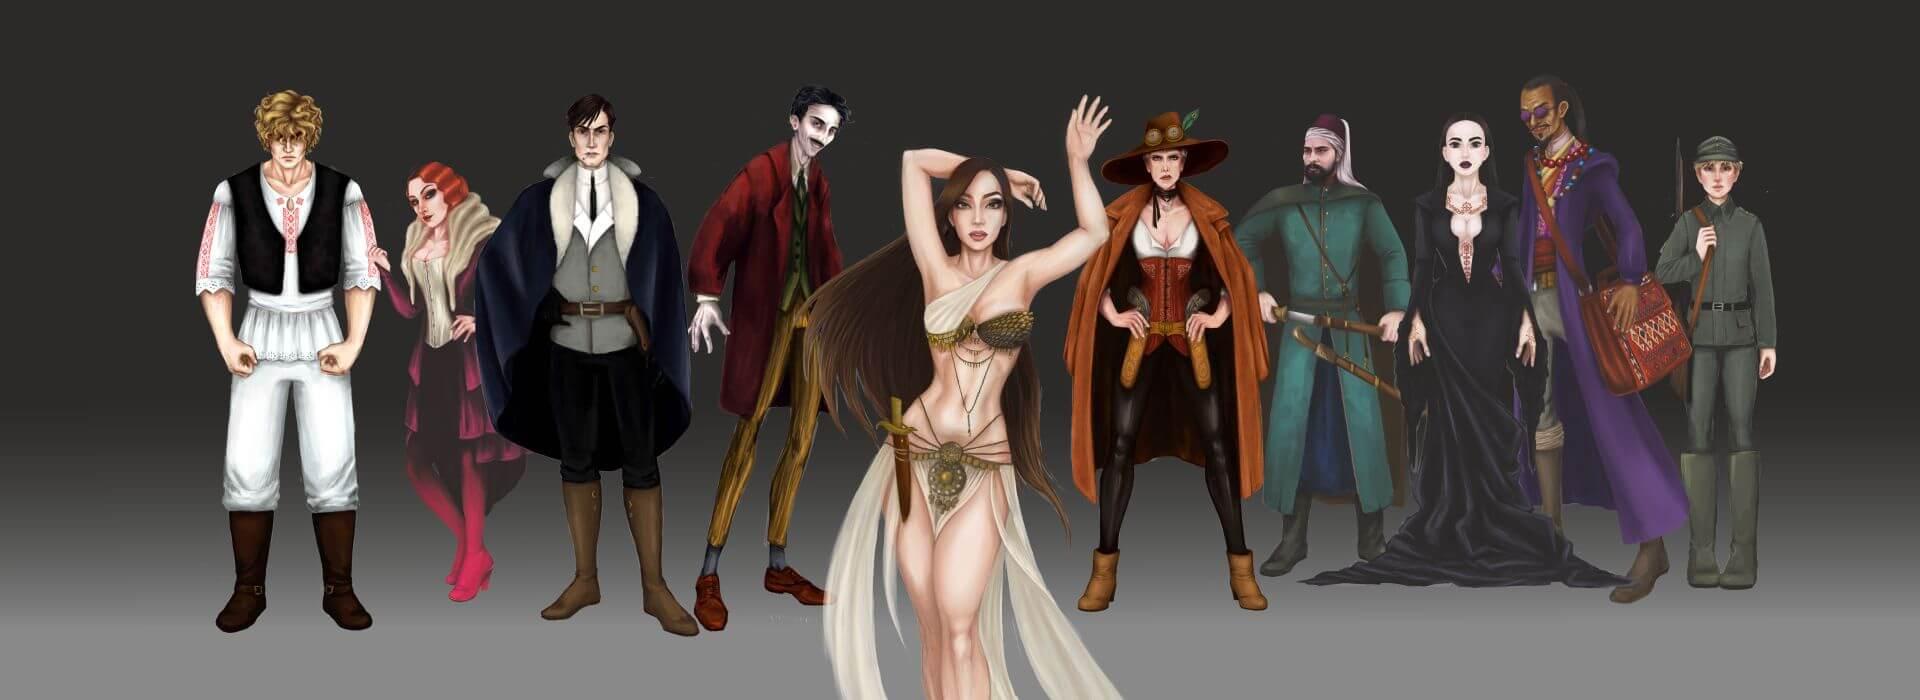 Arcadia Tenebra RPG board game